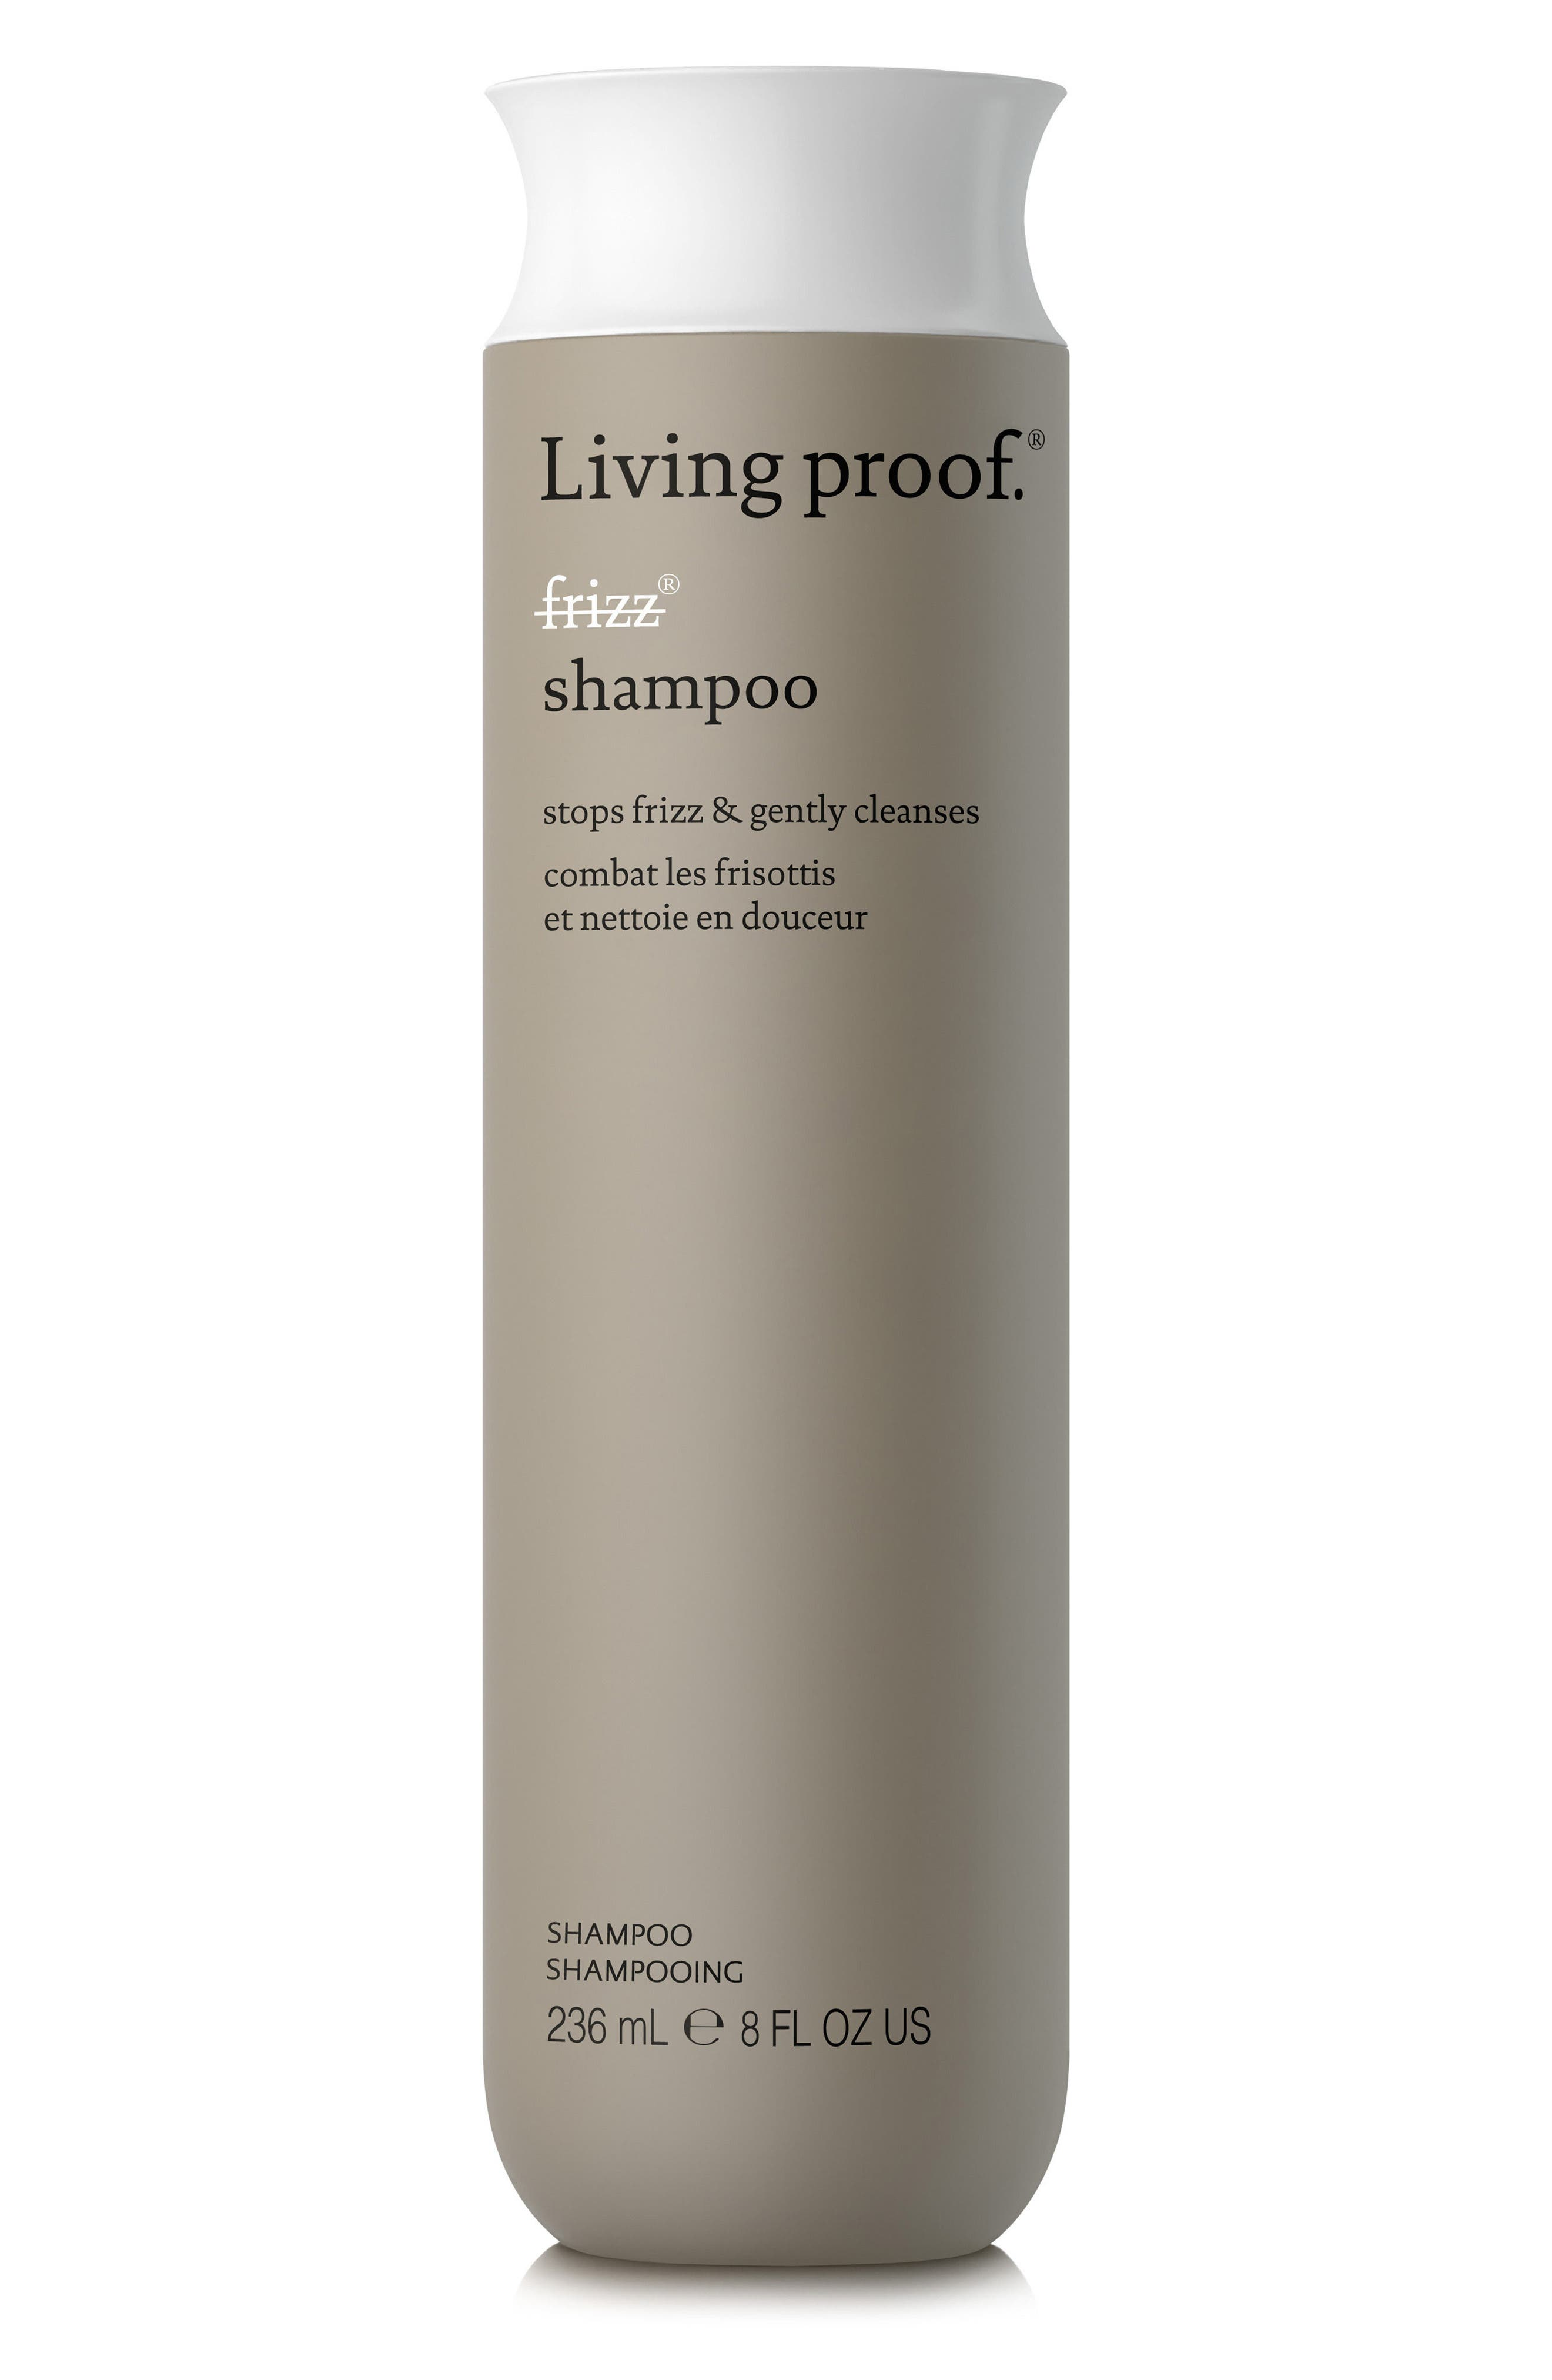 Alternate Image 1 Selected - Living proof® No Frizz Shampoo